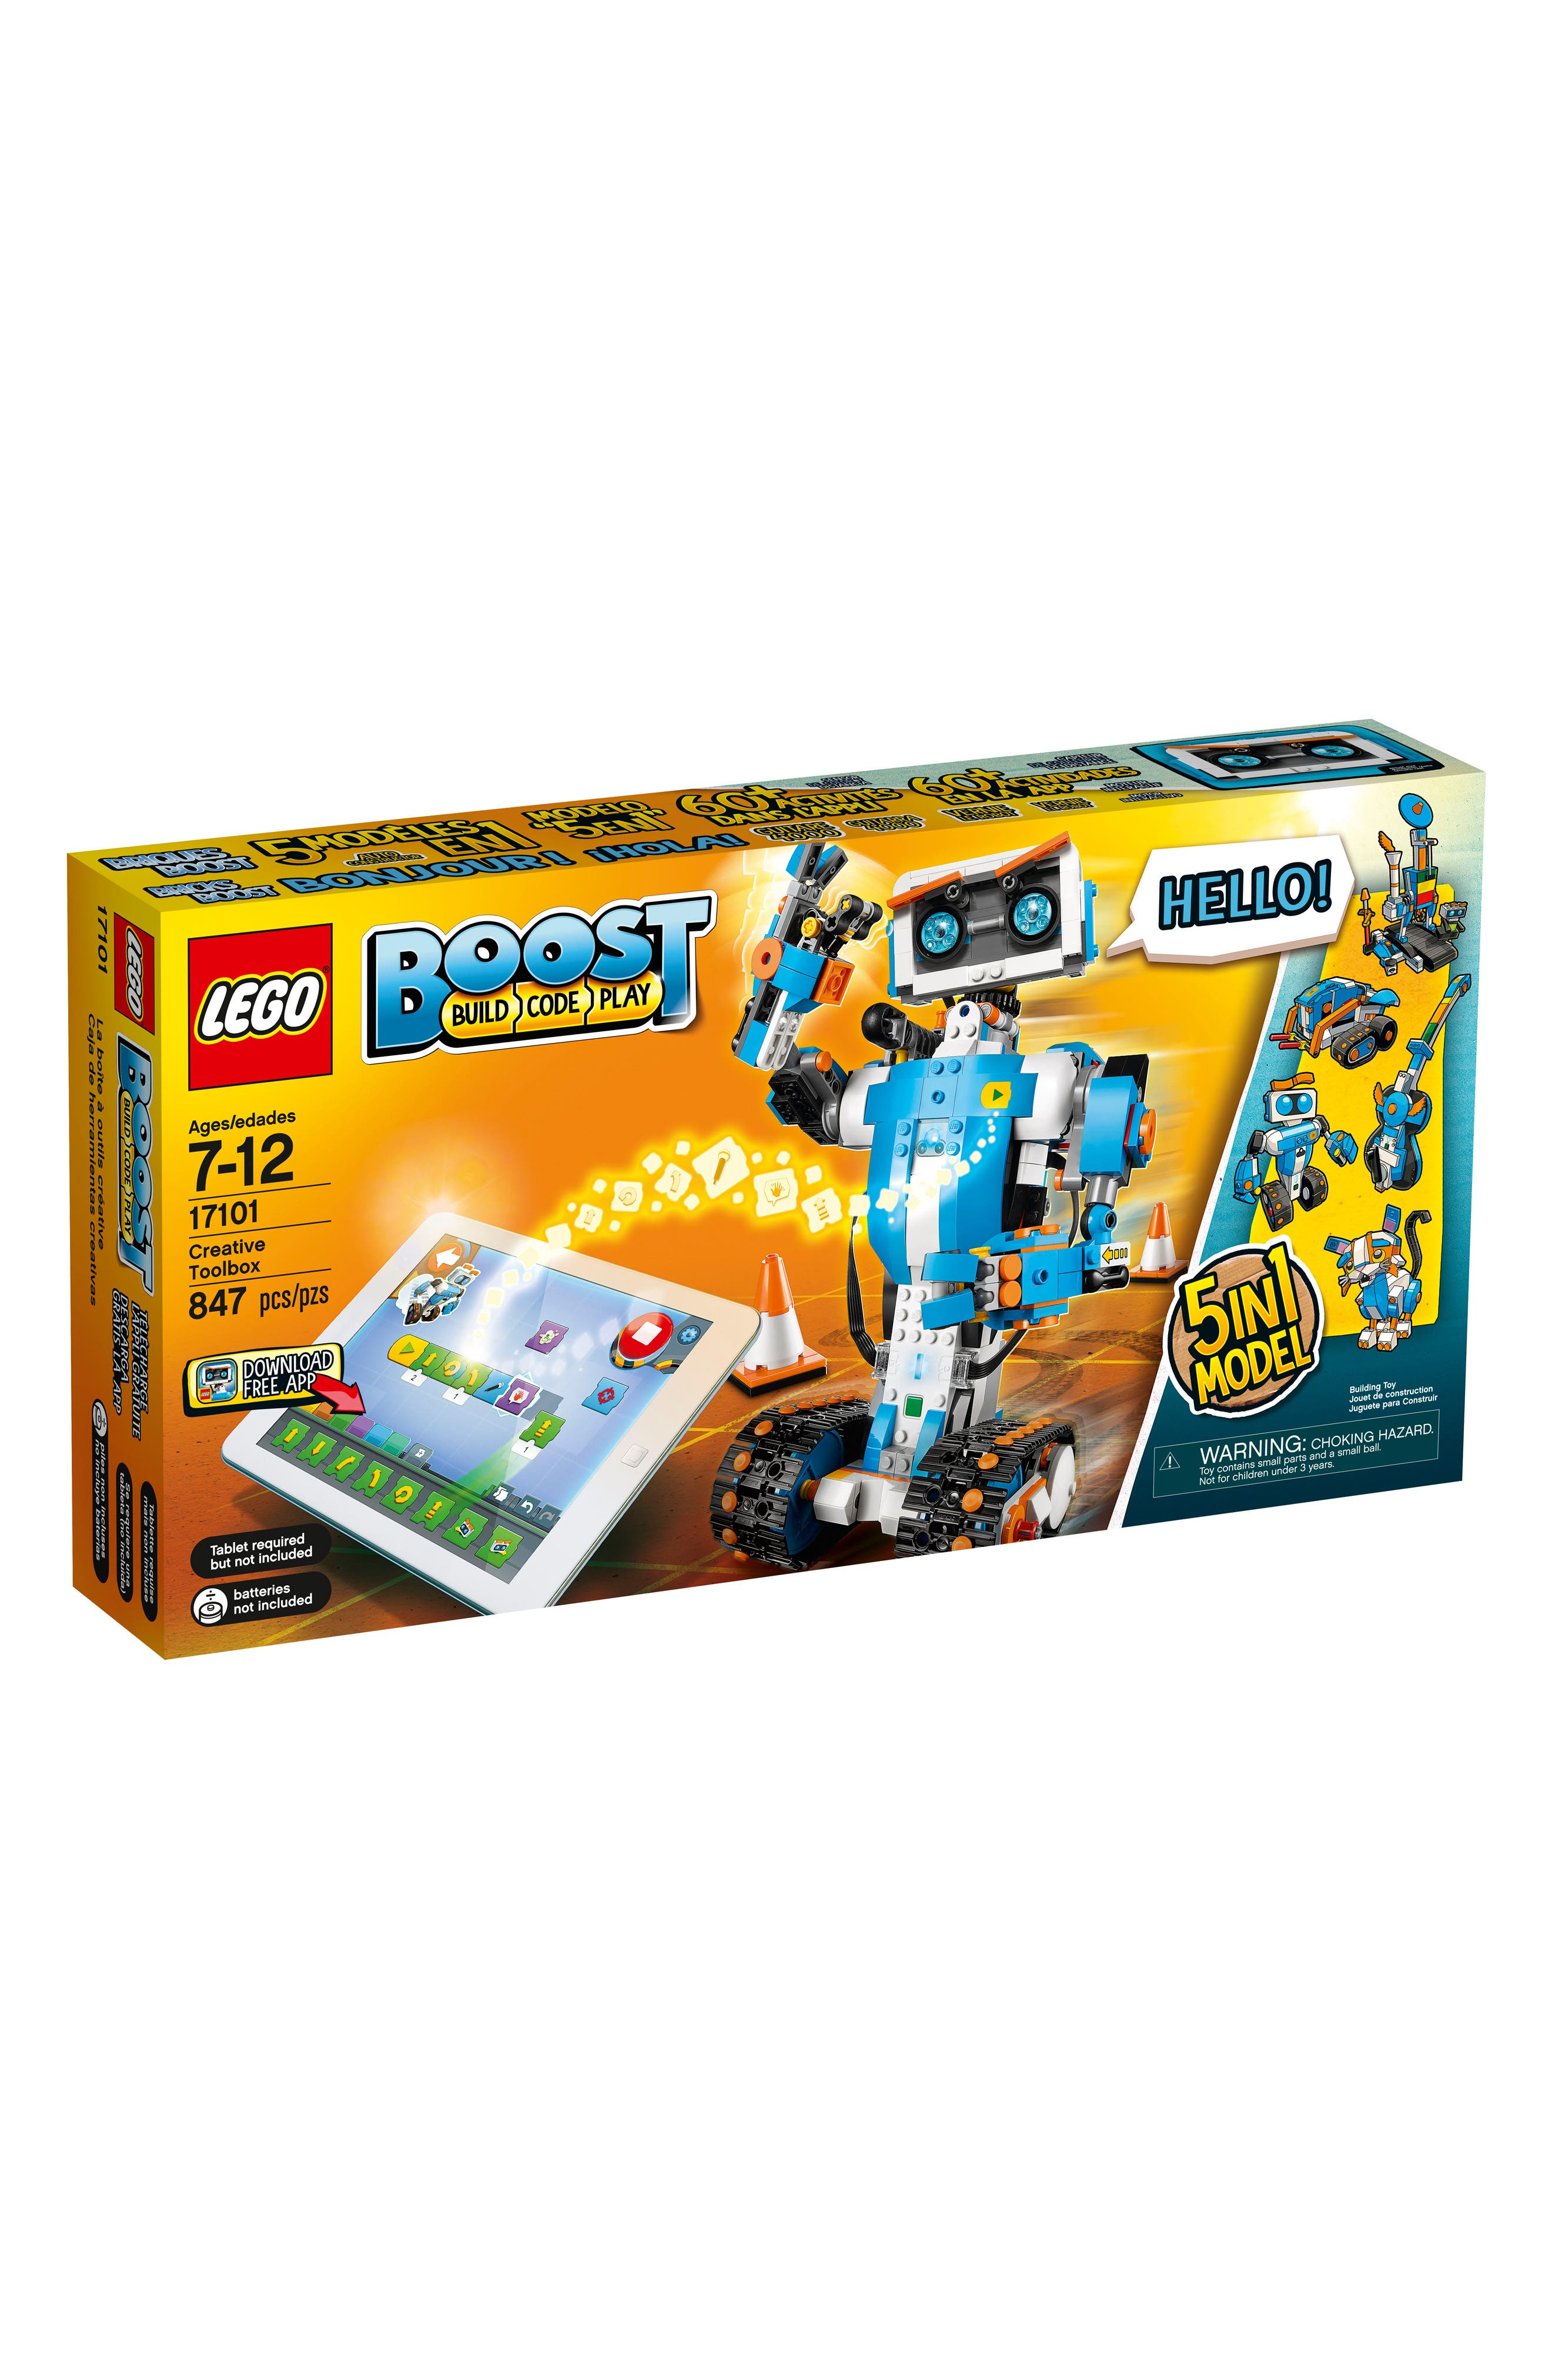 LEGO® BOOST Creative Toolbox Set - 17101